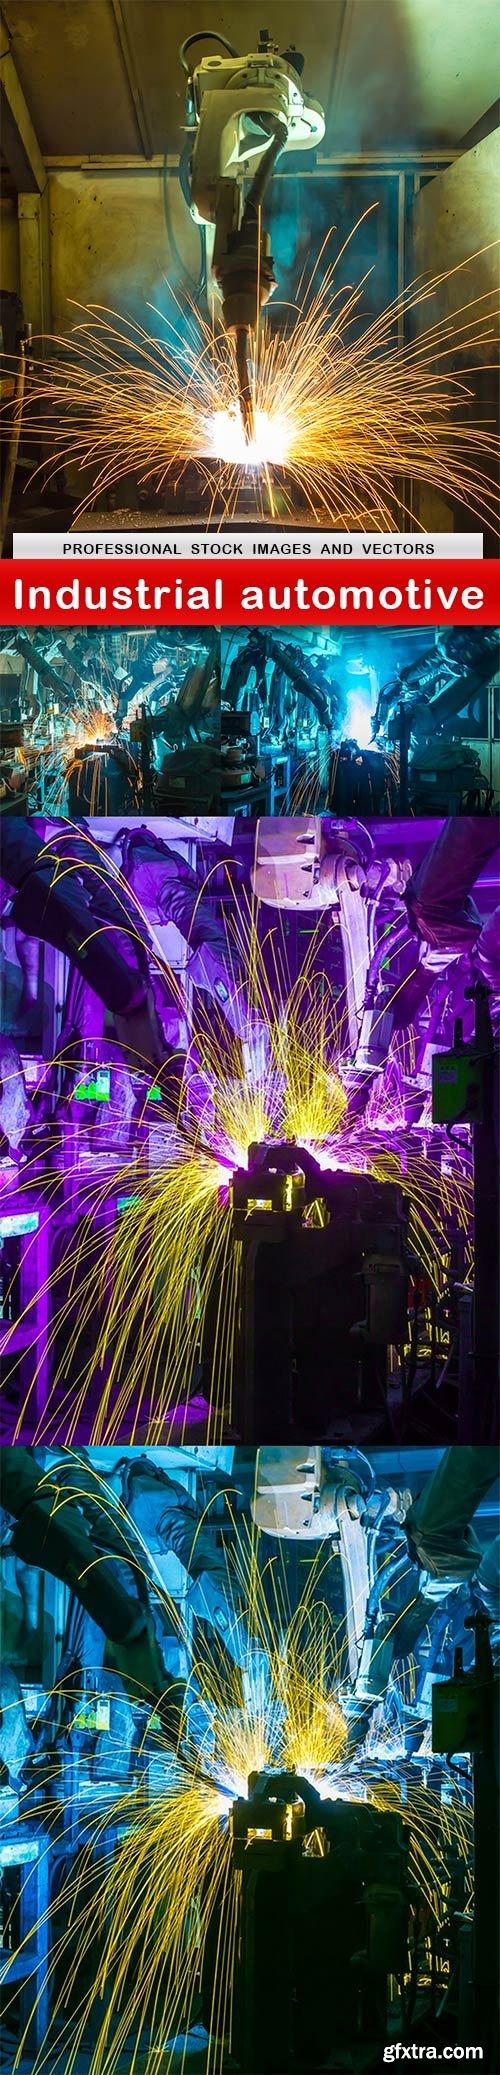 Industrial automotive - 5 UHQ JPEG